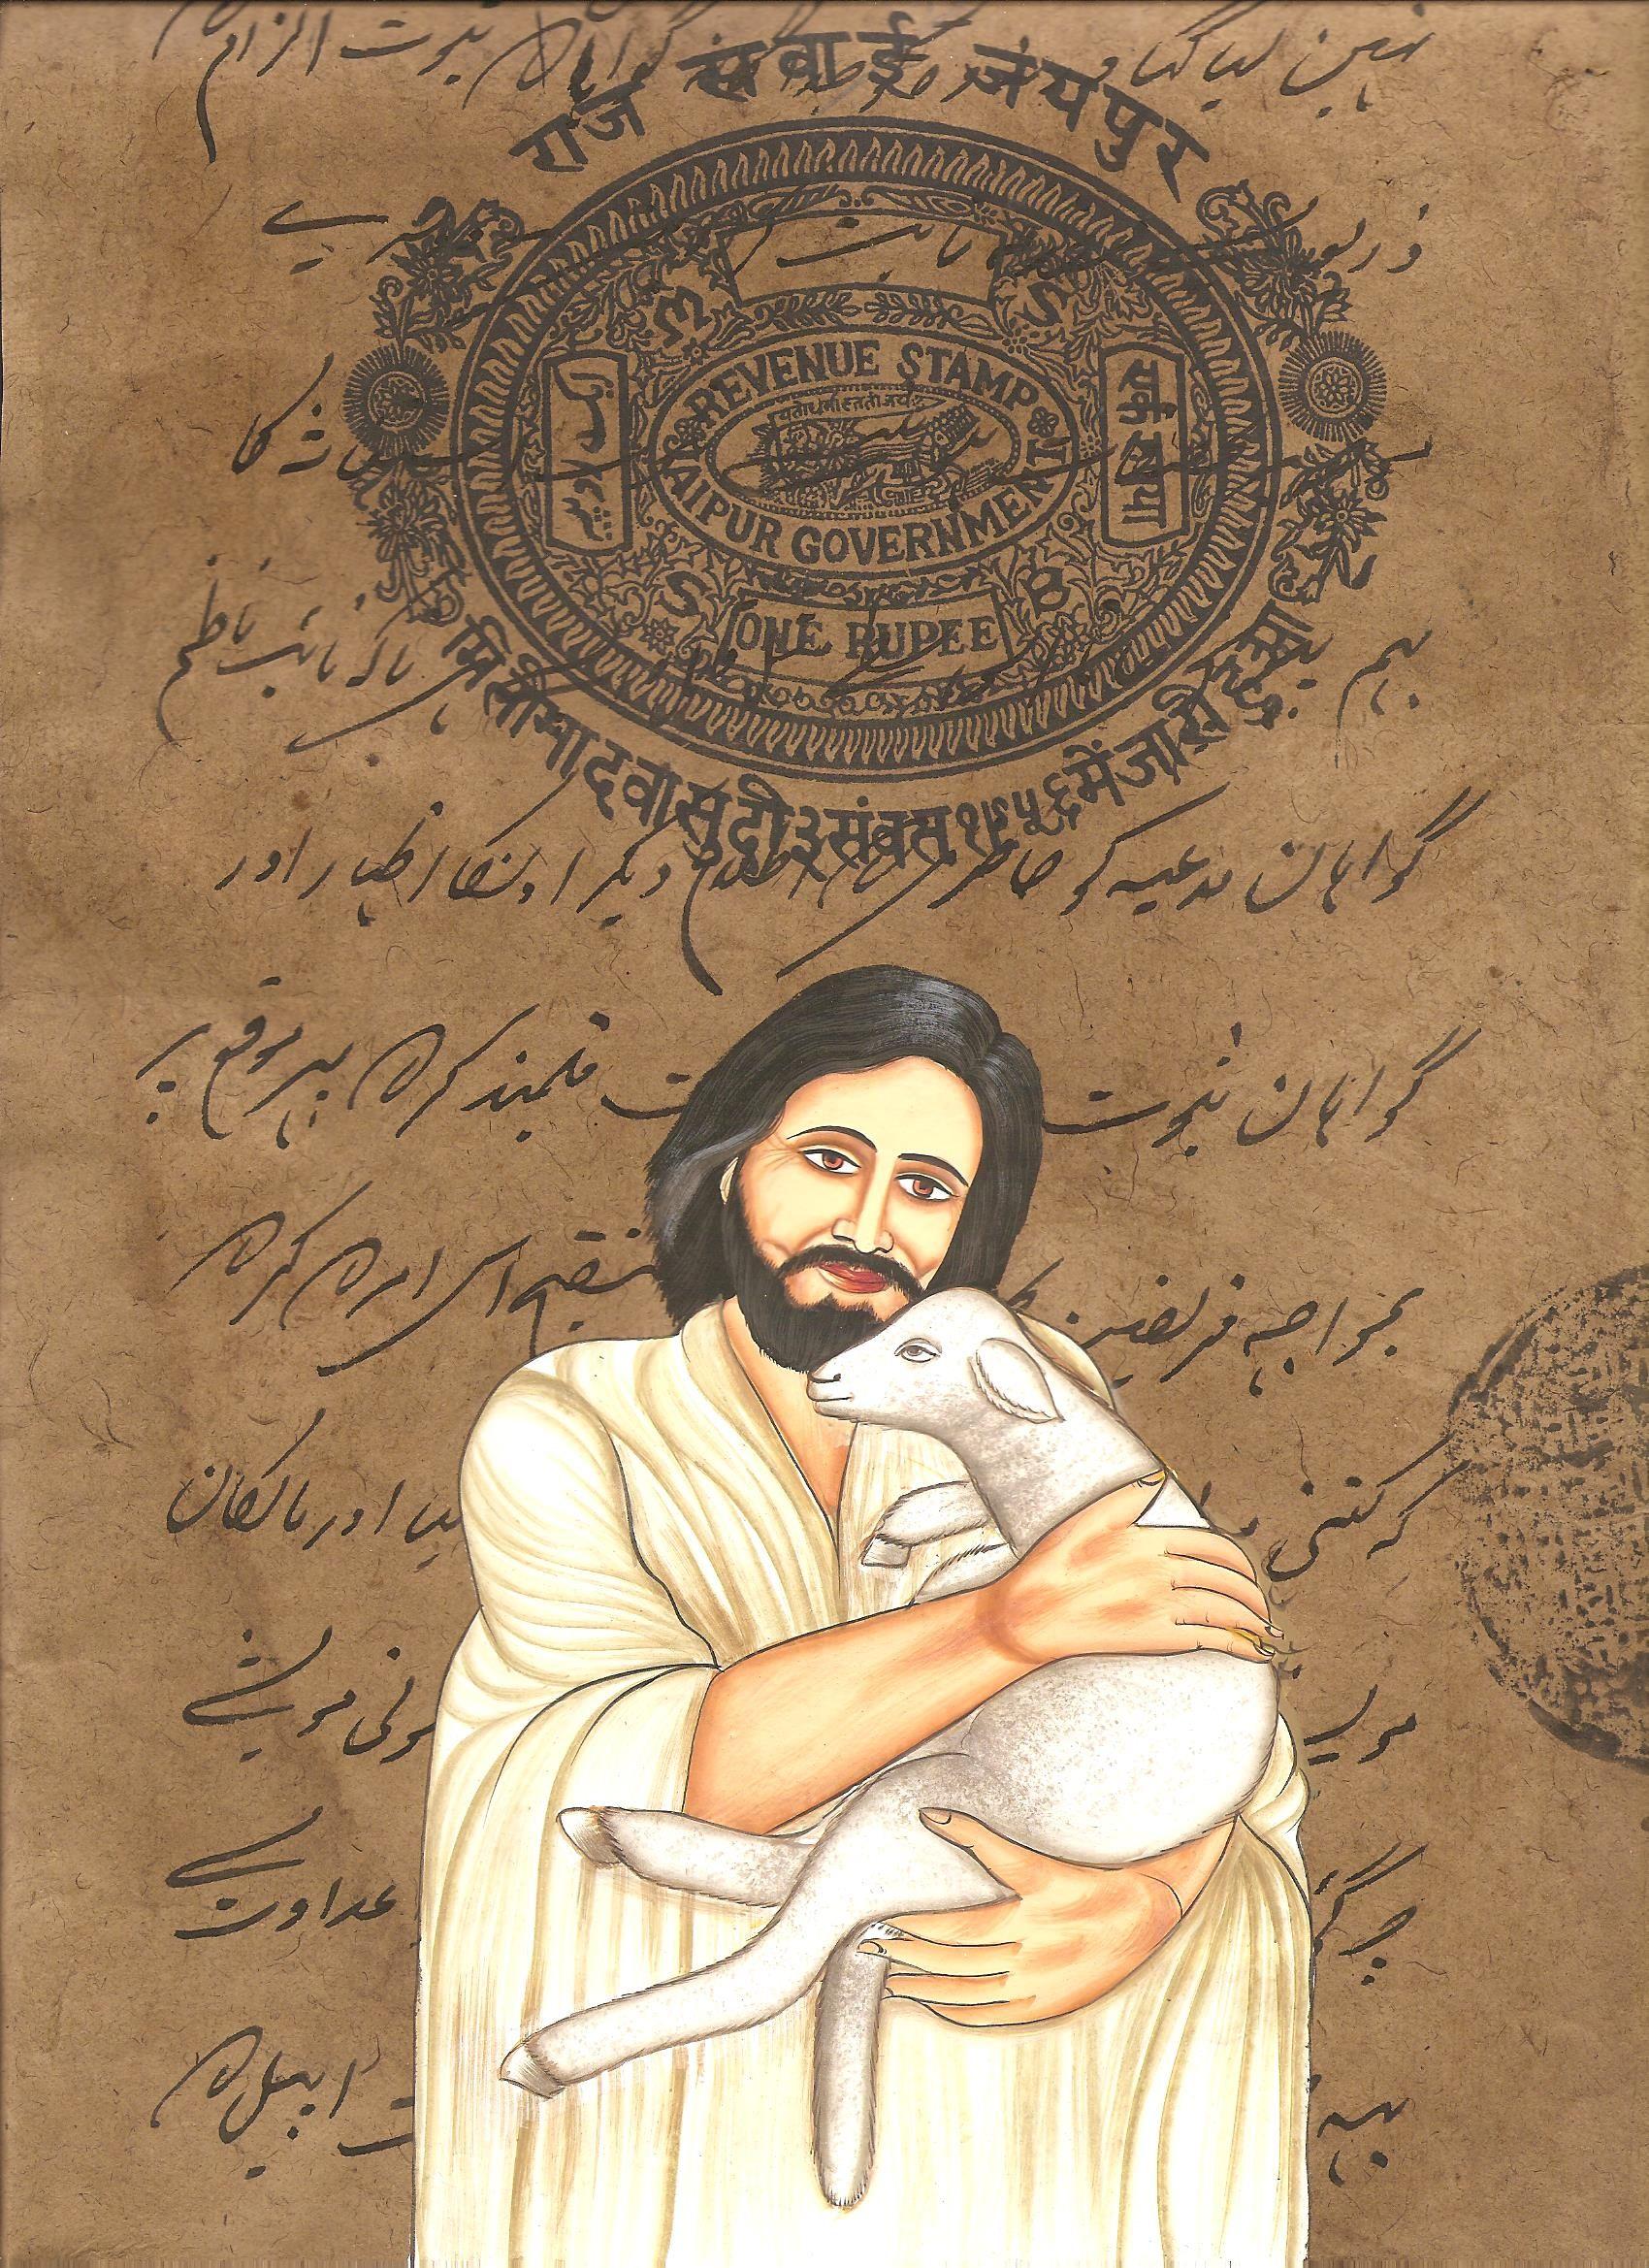 Jesus Christ Christian Art Rare Handmade Watercolor Painting On Old